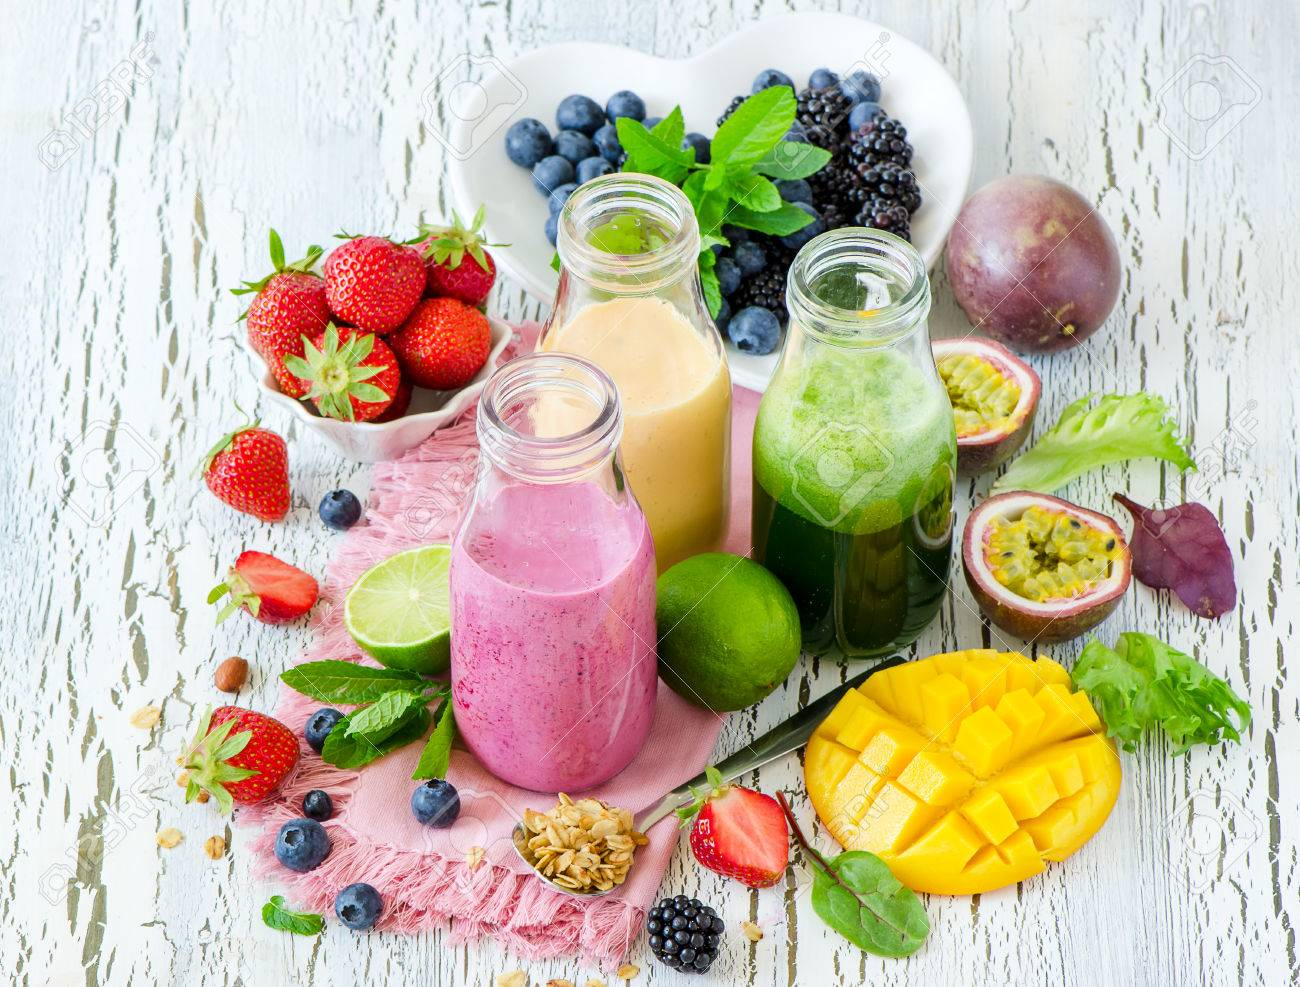 Berry and fruit smoothie in bottles, healthy summer detox yogurt drink, diet or vegan food concept, fresh vitamins, mango, lime, passtion fruits - 60675062